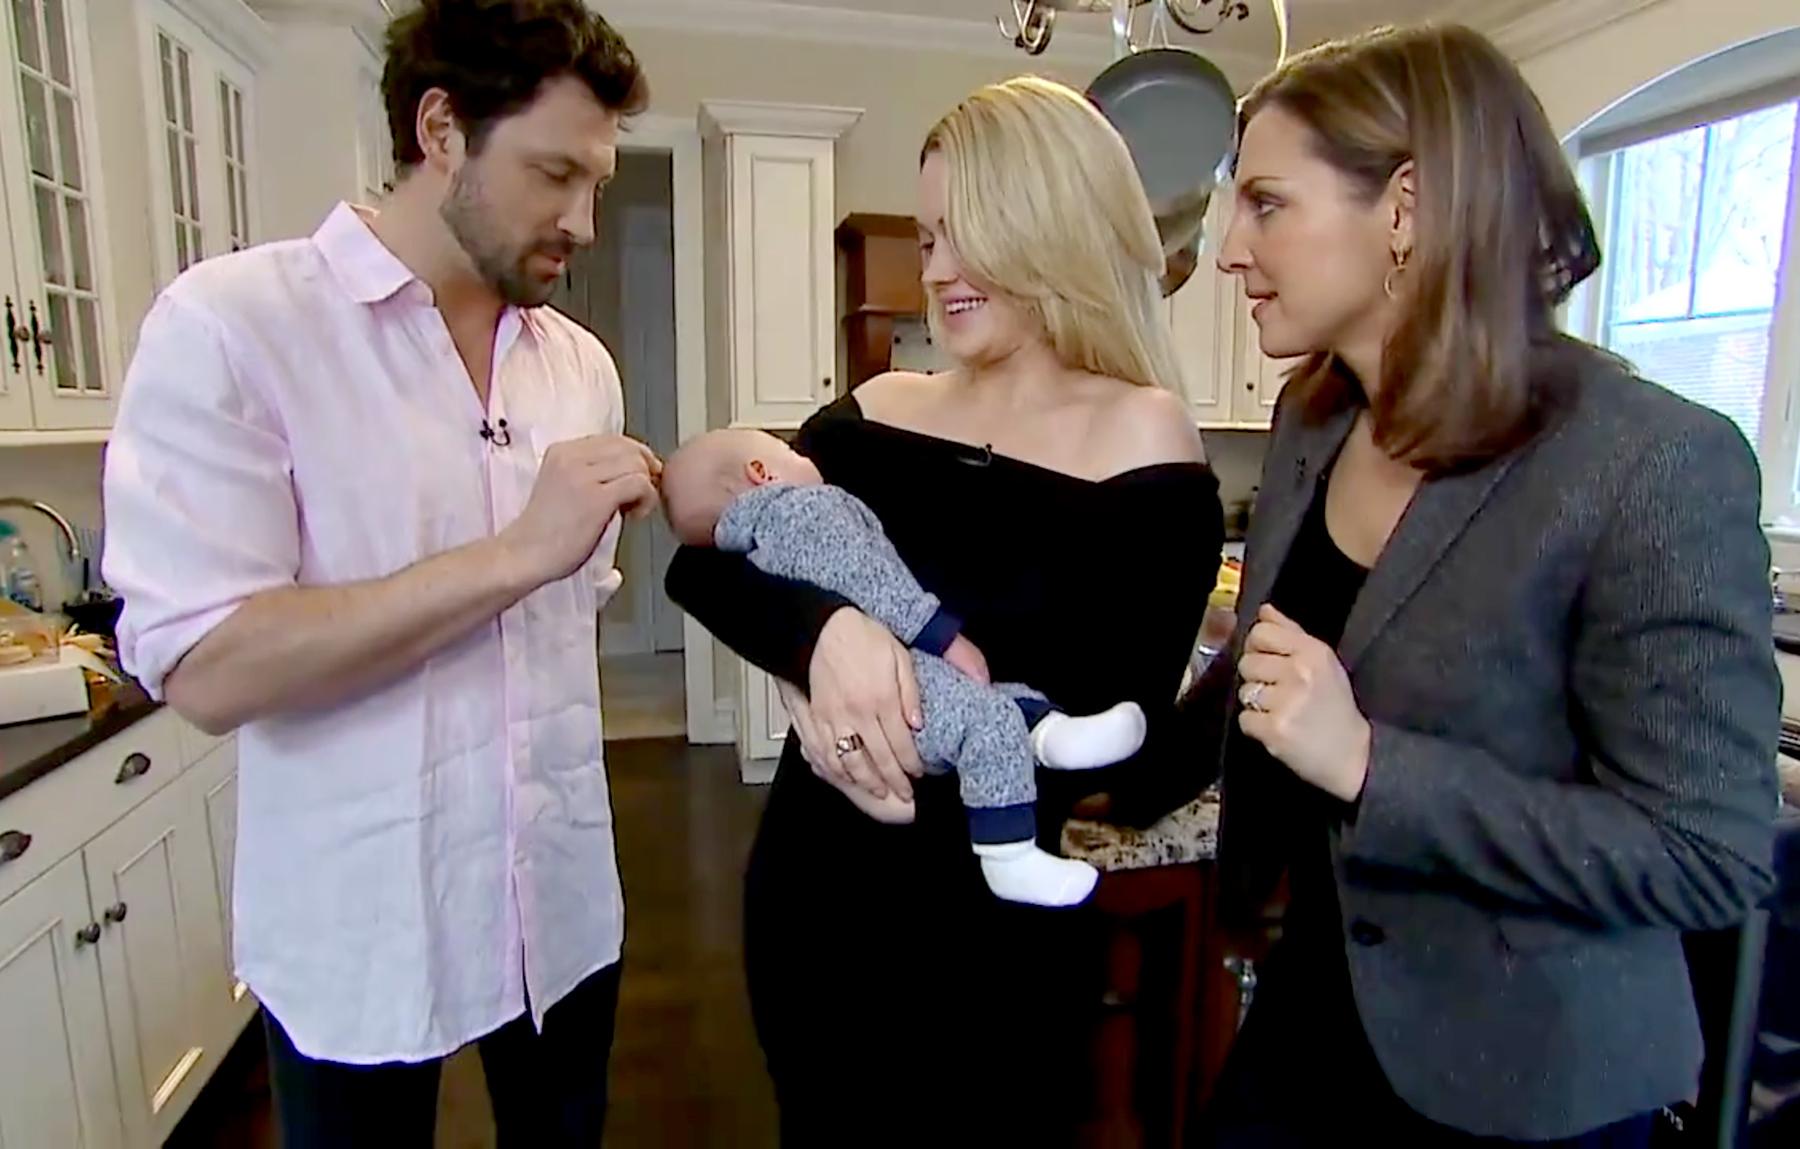 Maksim Chmerkovskiy and Peta Murgatroyd debut son Shai